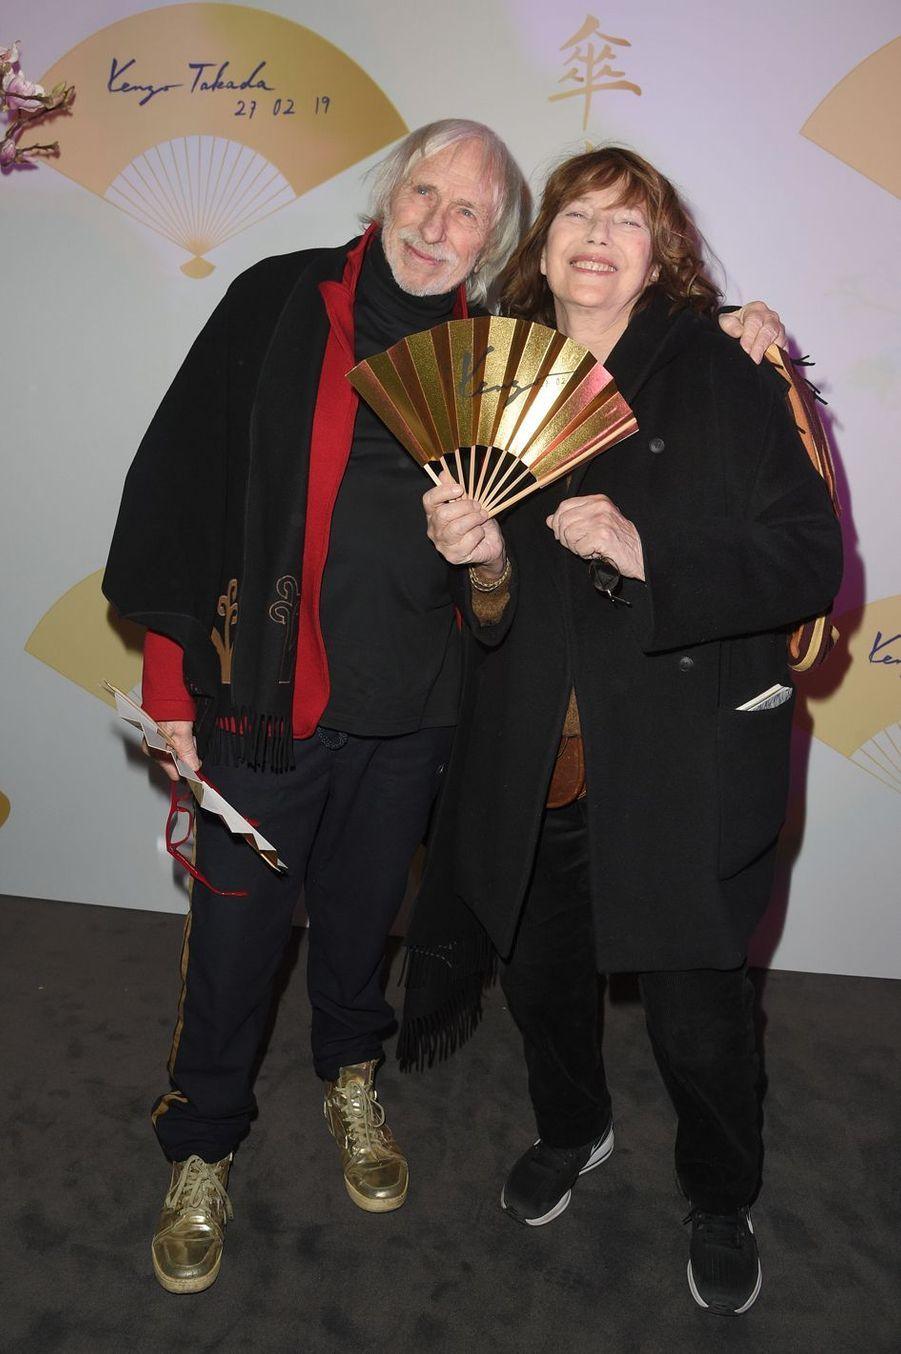 "Pierre Richard et Jane Birkin pendant la soirée ""Kenzo Takada's Birthday Night"" à Paris, le 28 février 2019"